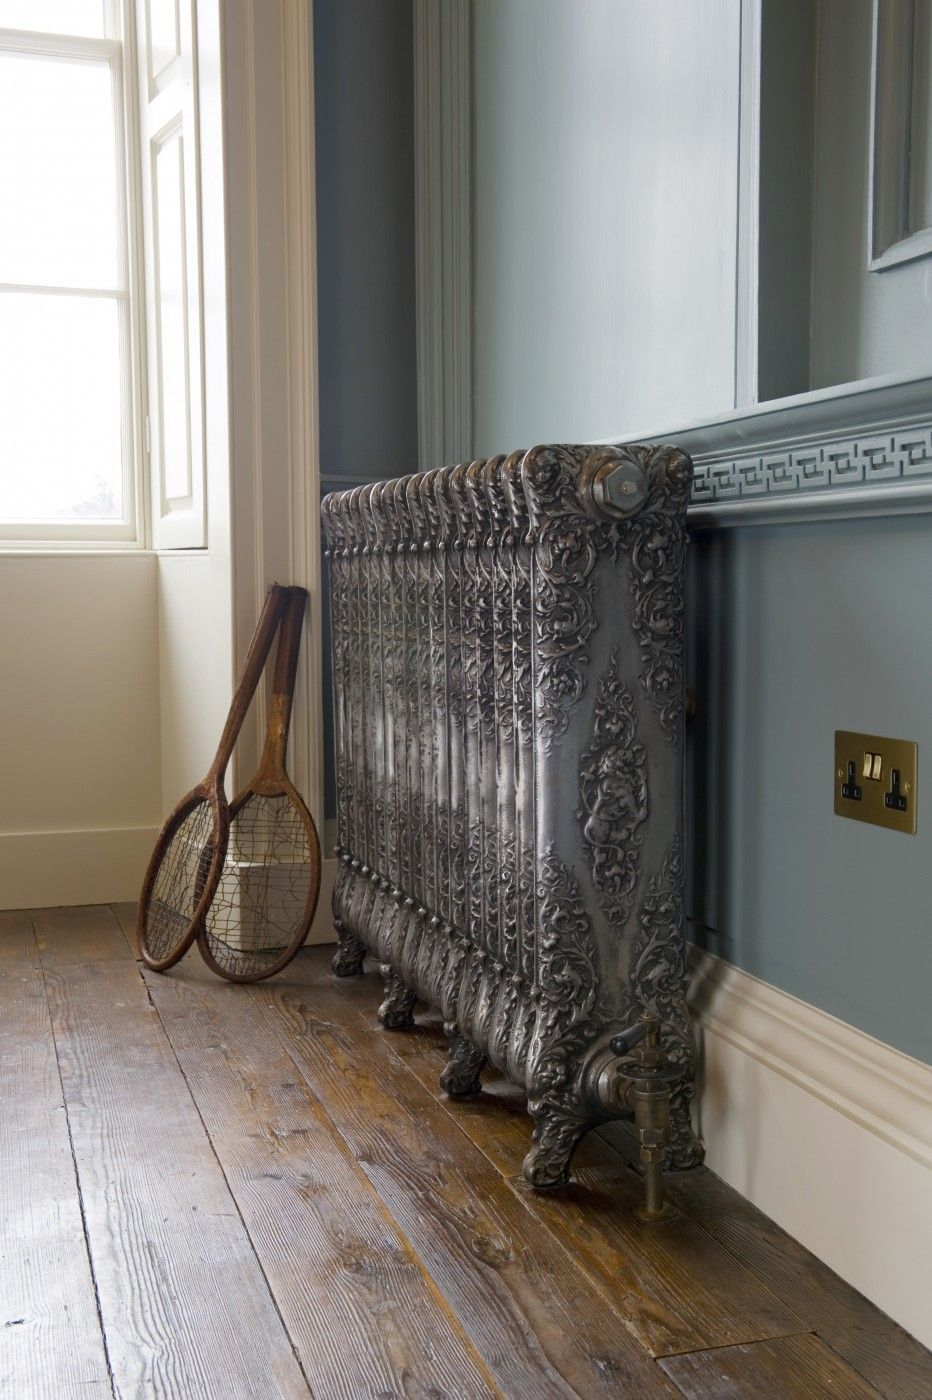 How Did Radiator Plants Become The Best: Decorative Cast Iron Radiators